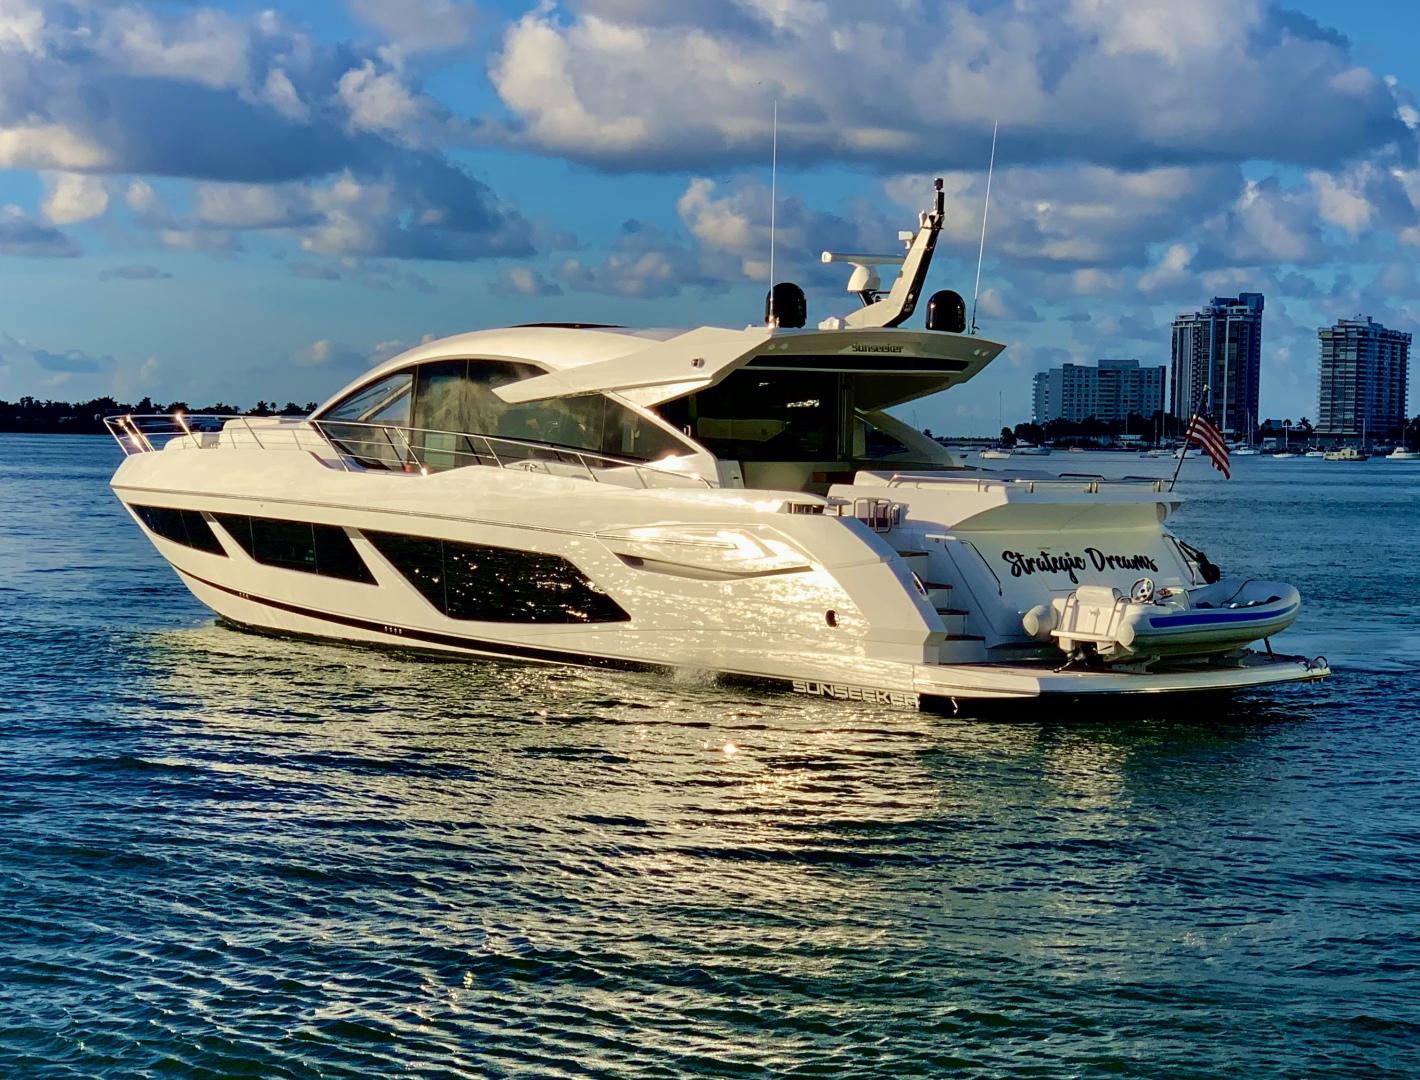 Sunseeker-74 Predator 2019-Strategic Dreams Fort Lauderdale-Florida-United States-1255905 | Thumbnail